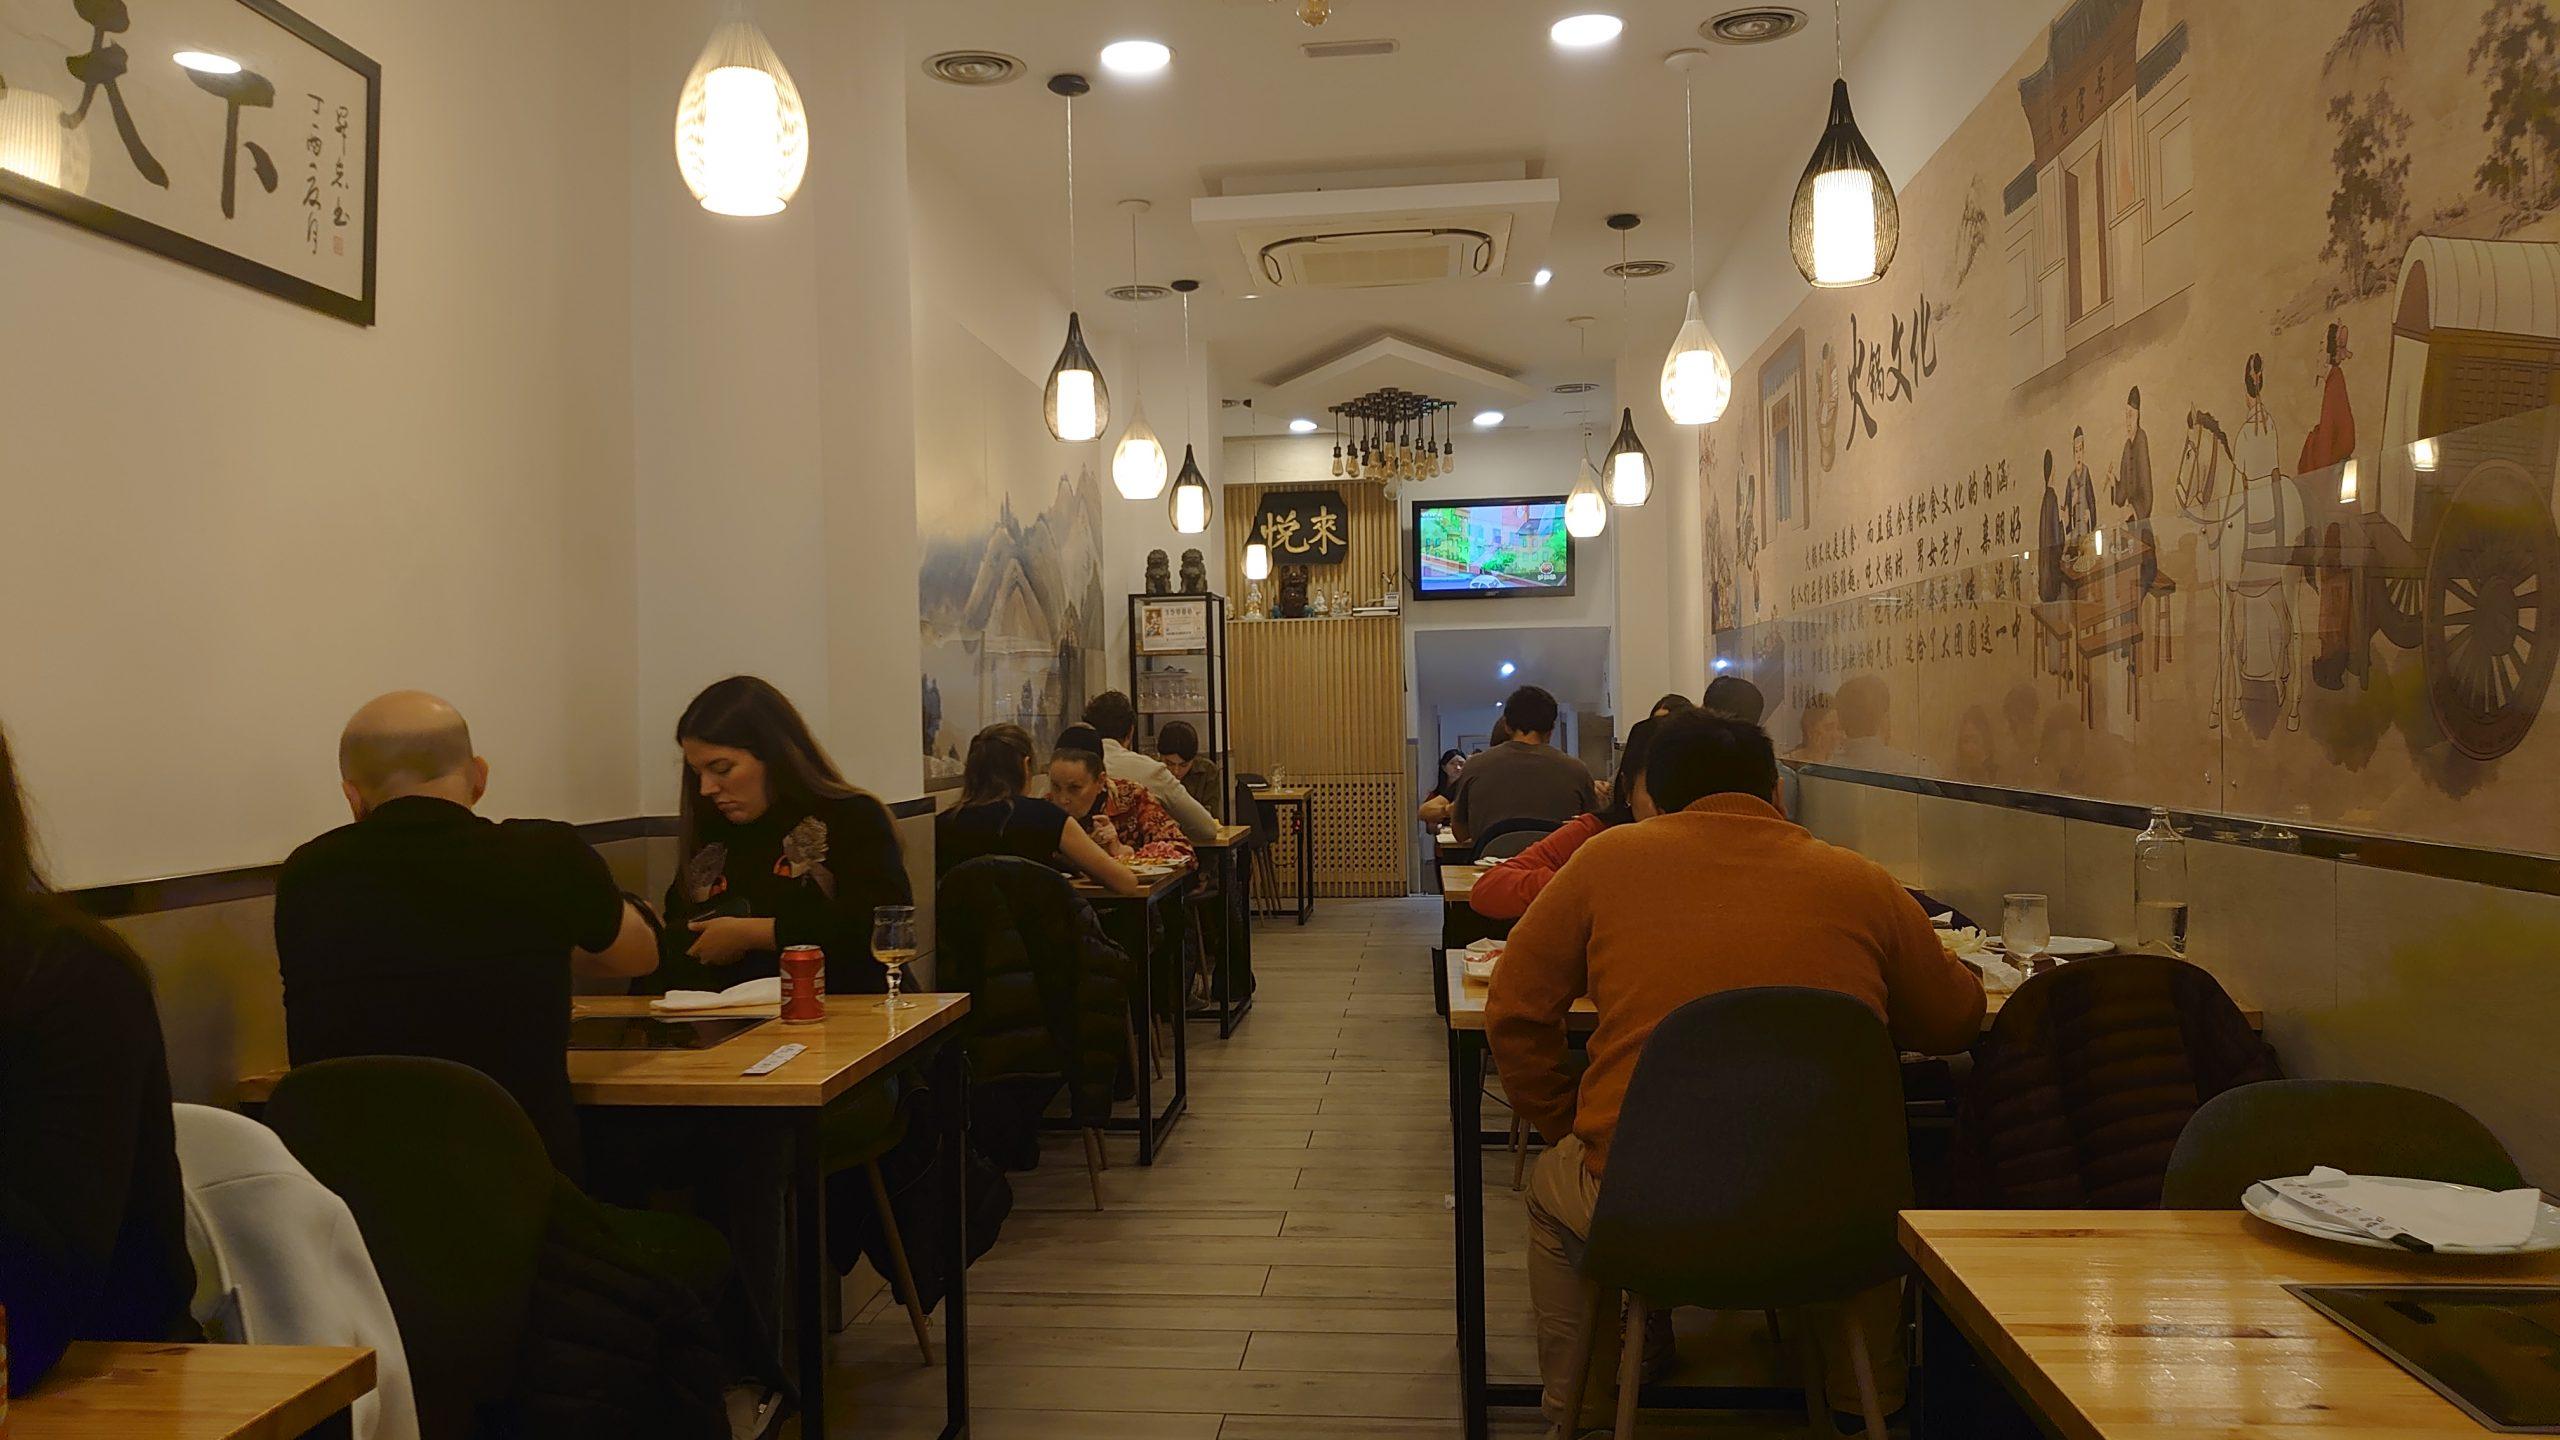 Restaurante Yue Lai (Joya Oriental)